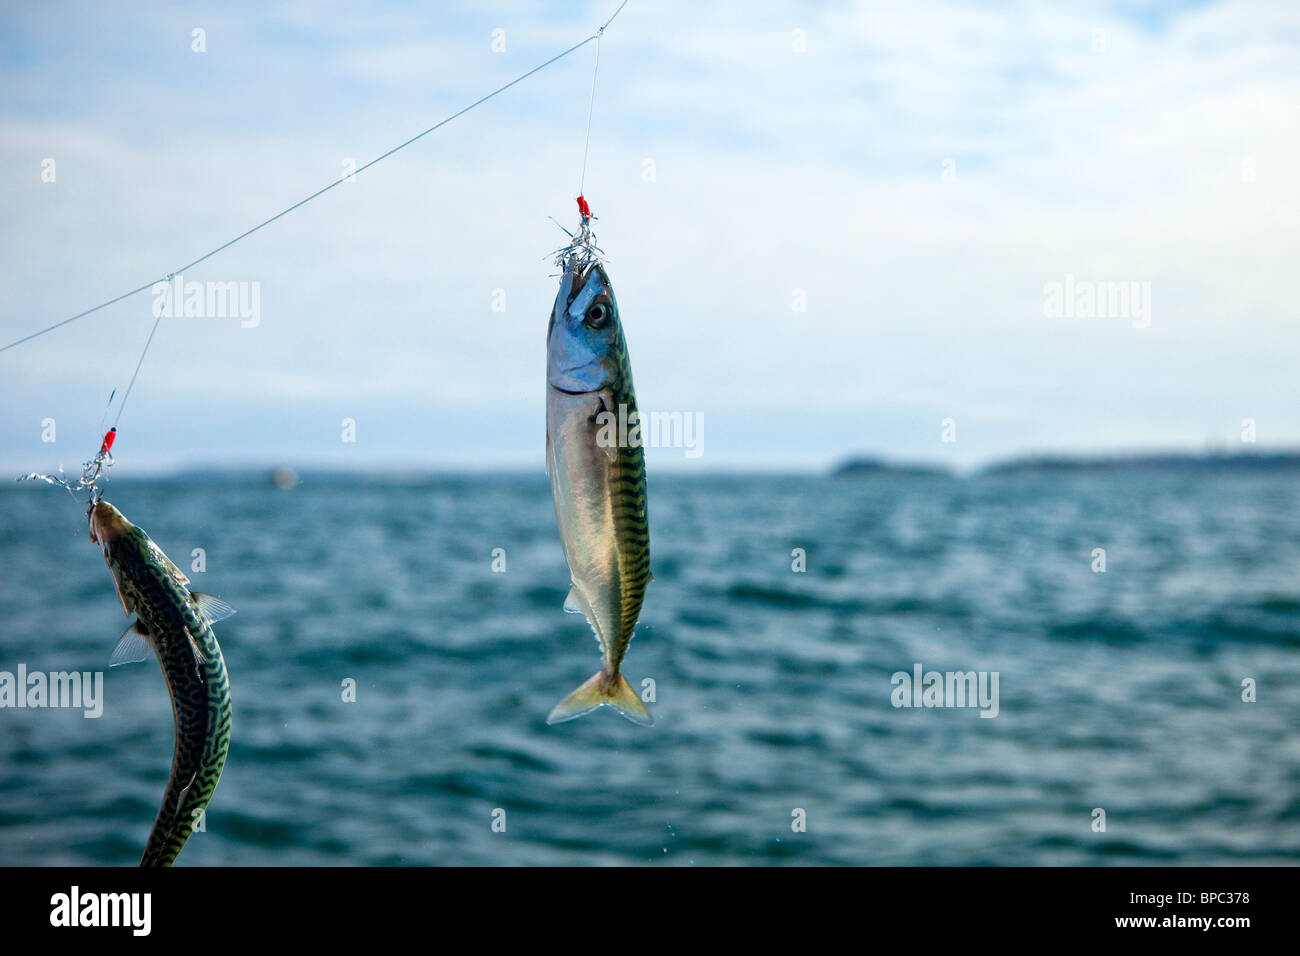 Mackerel Fishing off North Beach, Tenby,Pembrokeshire West Wales UK - Stock Image